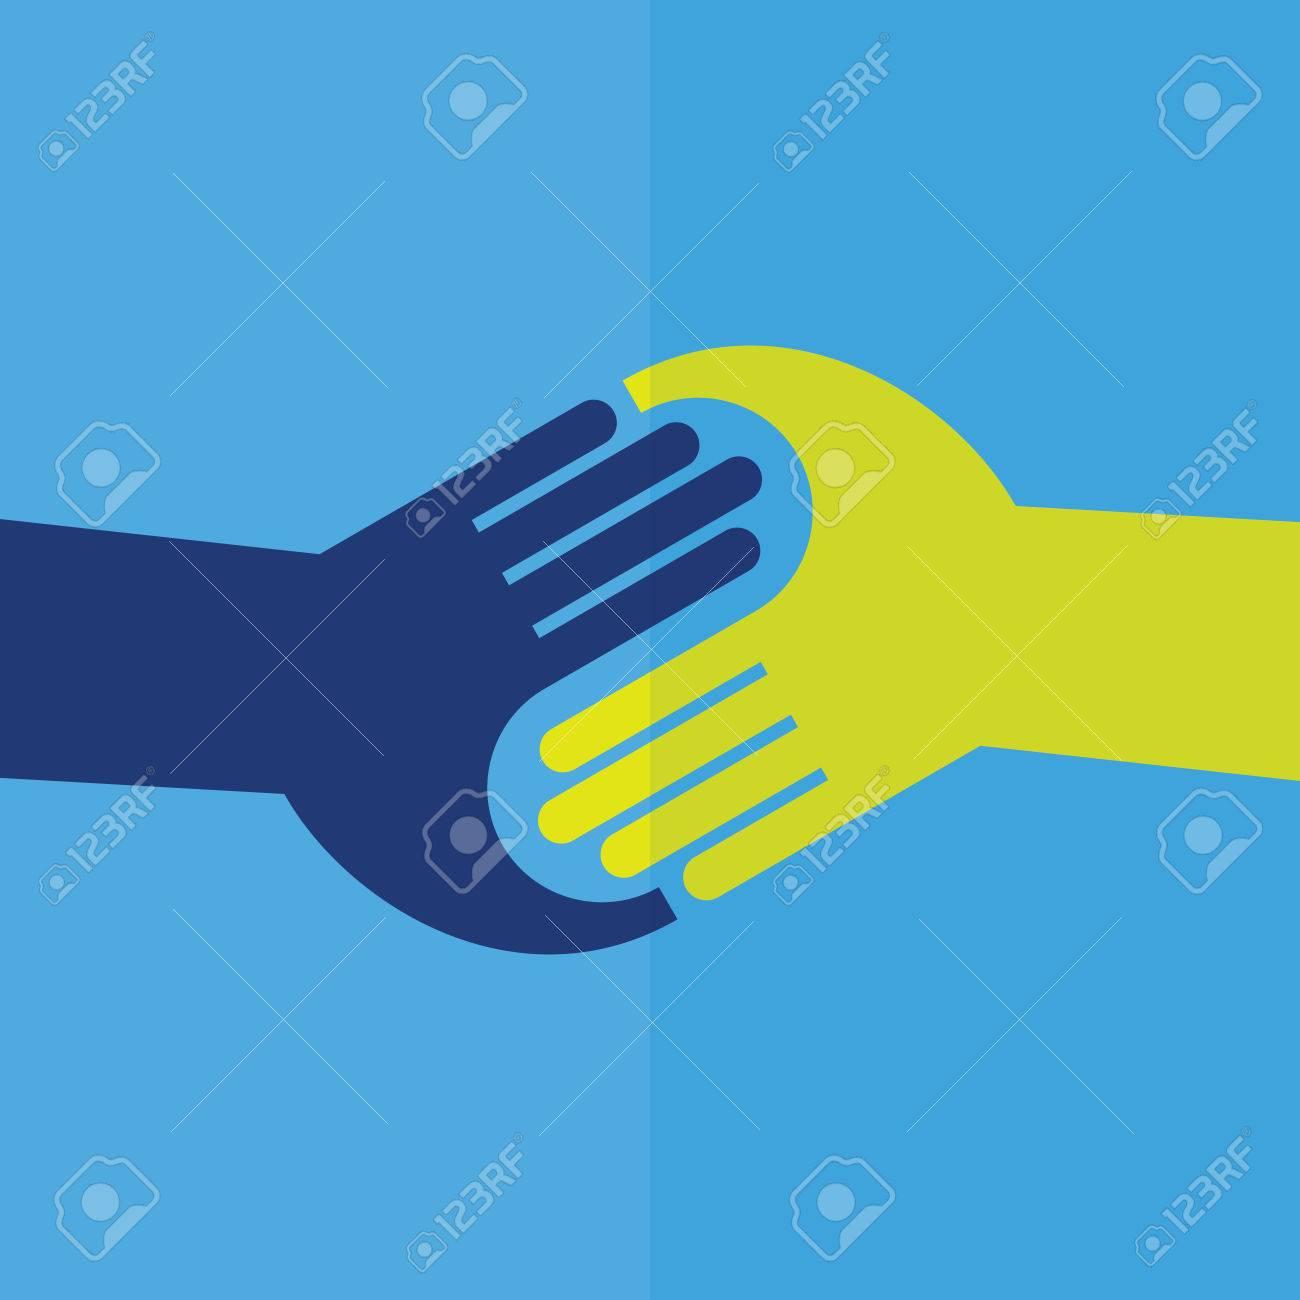 Teamwork Handshake . Vector illustration. - 61265807